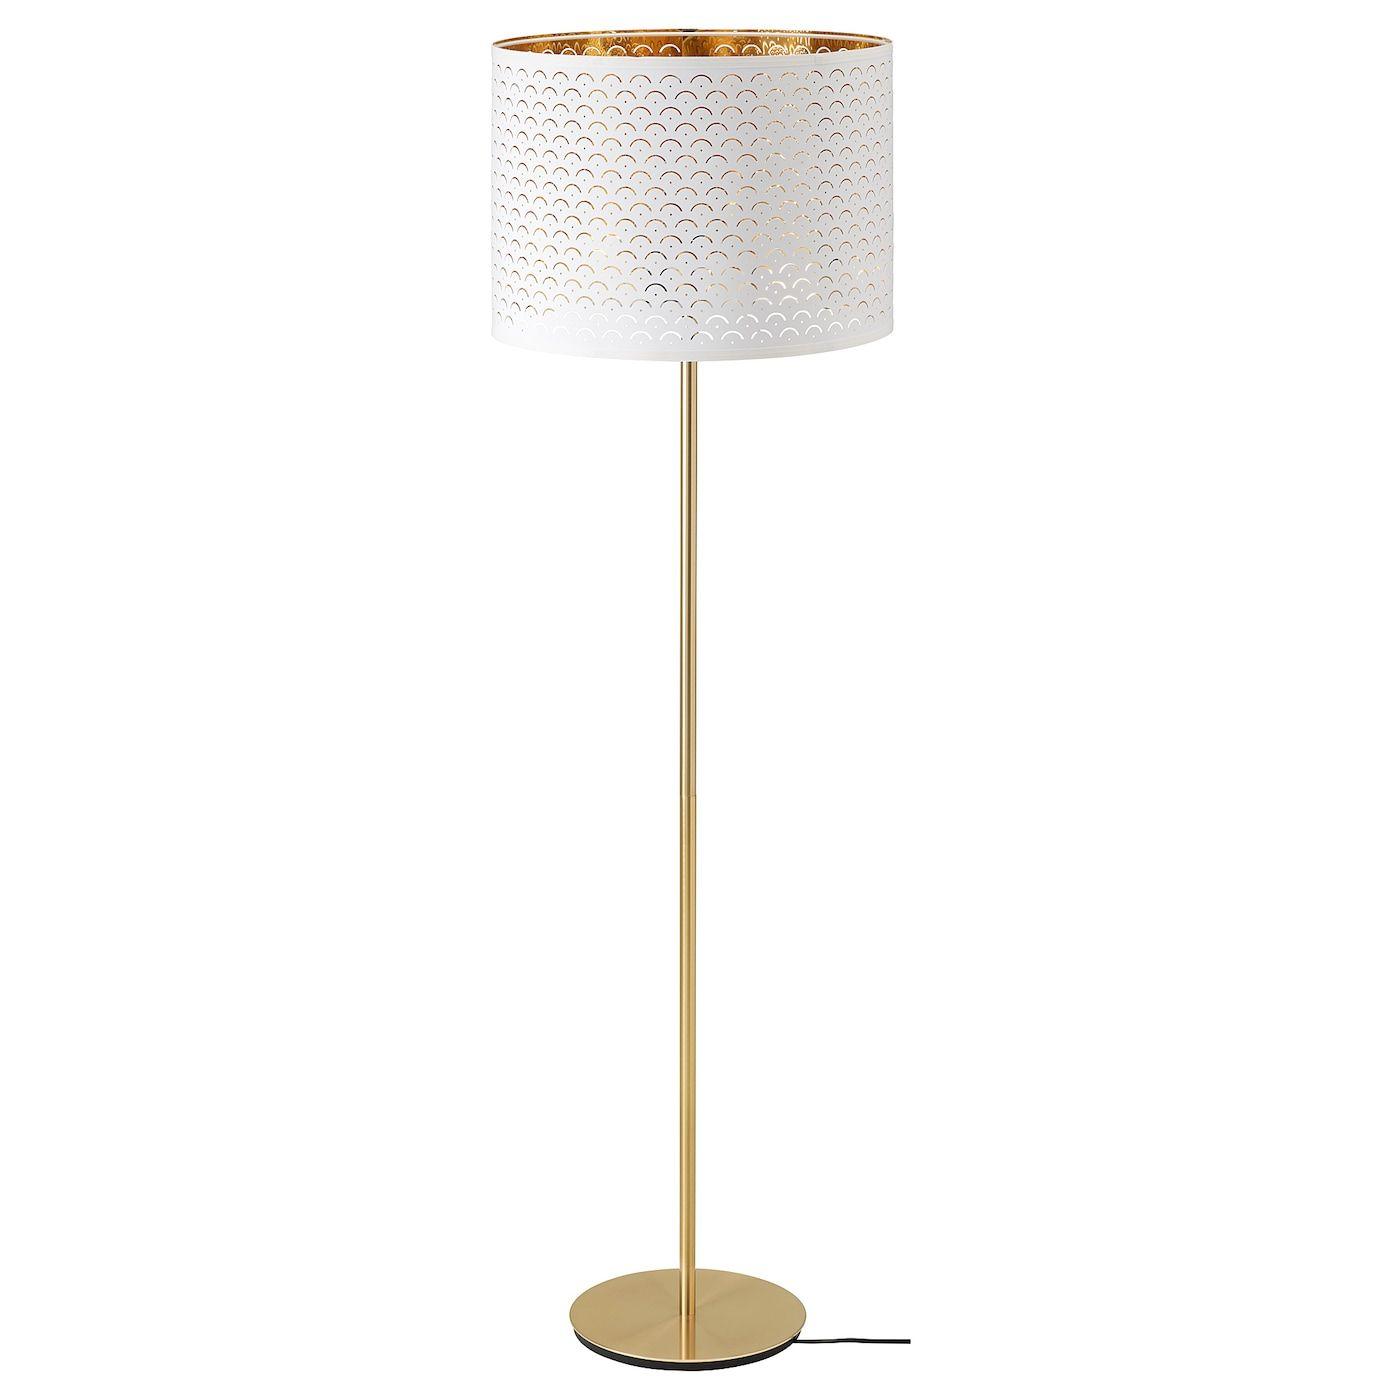 Rode Draaistoel Ikea.Nymo Skaftet Lampara De Pie In 2020 Lichtarmaturen Lampen E27